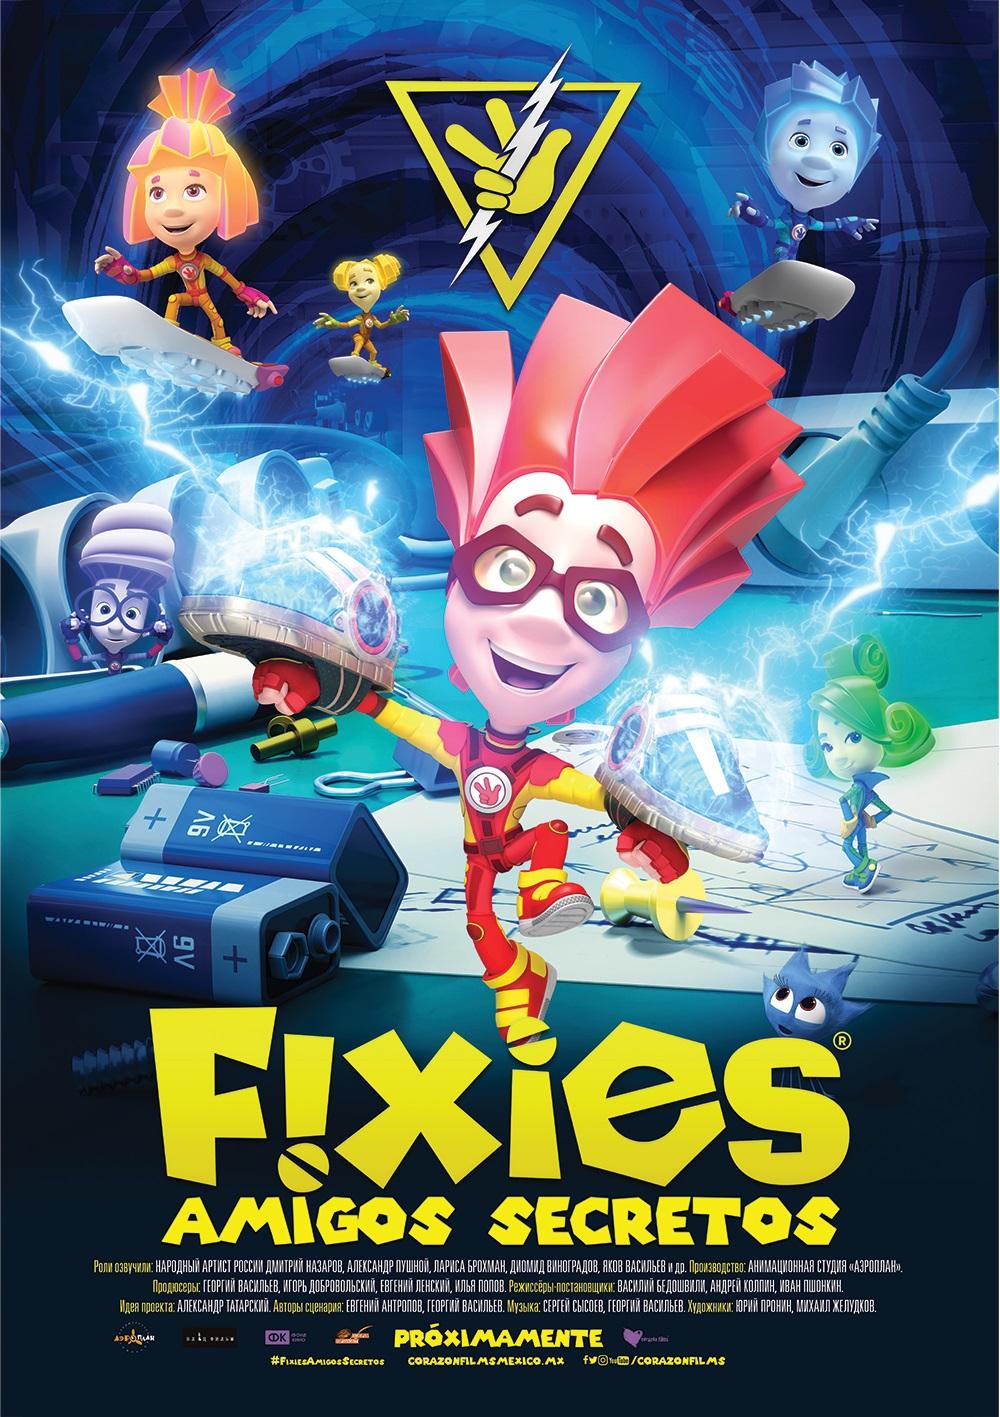 Fixies: Amigos Secretos / Próximamente